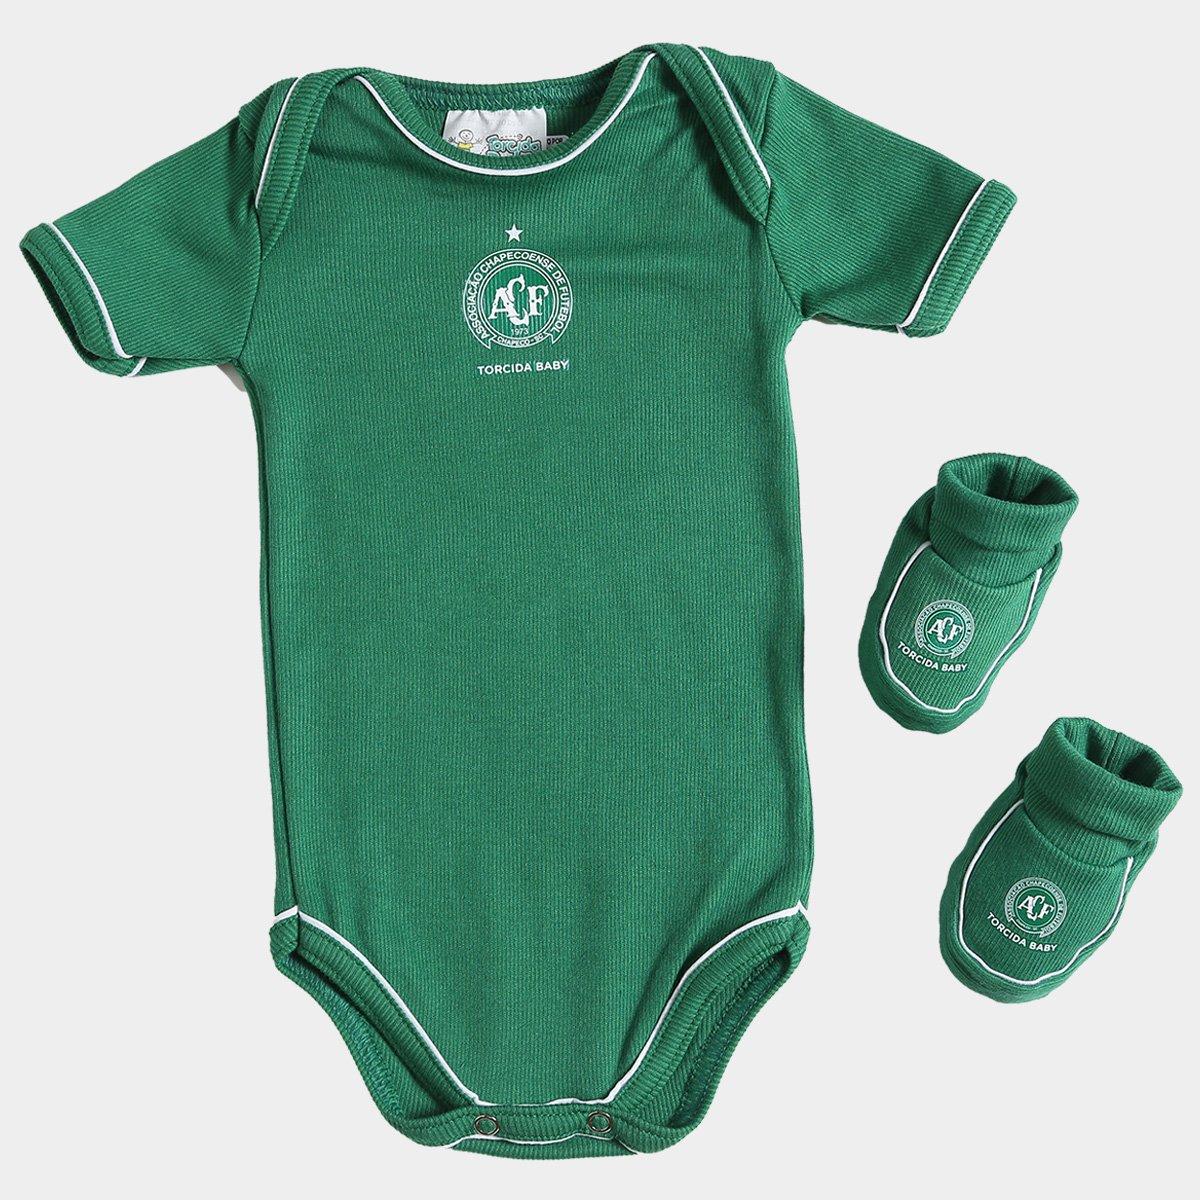 9075f00c42 Kit Chapecoense Infantil Torcida Baby - Compre Agora